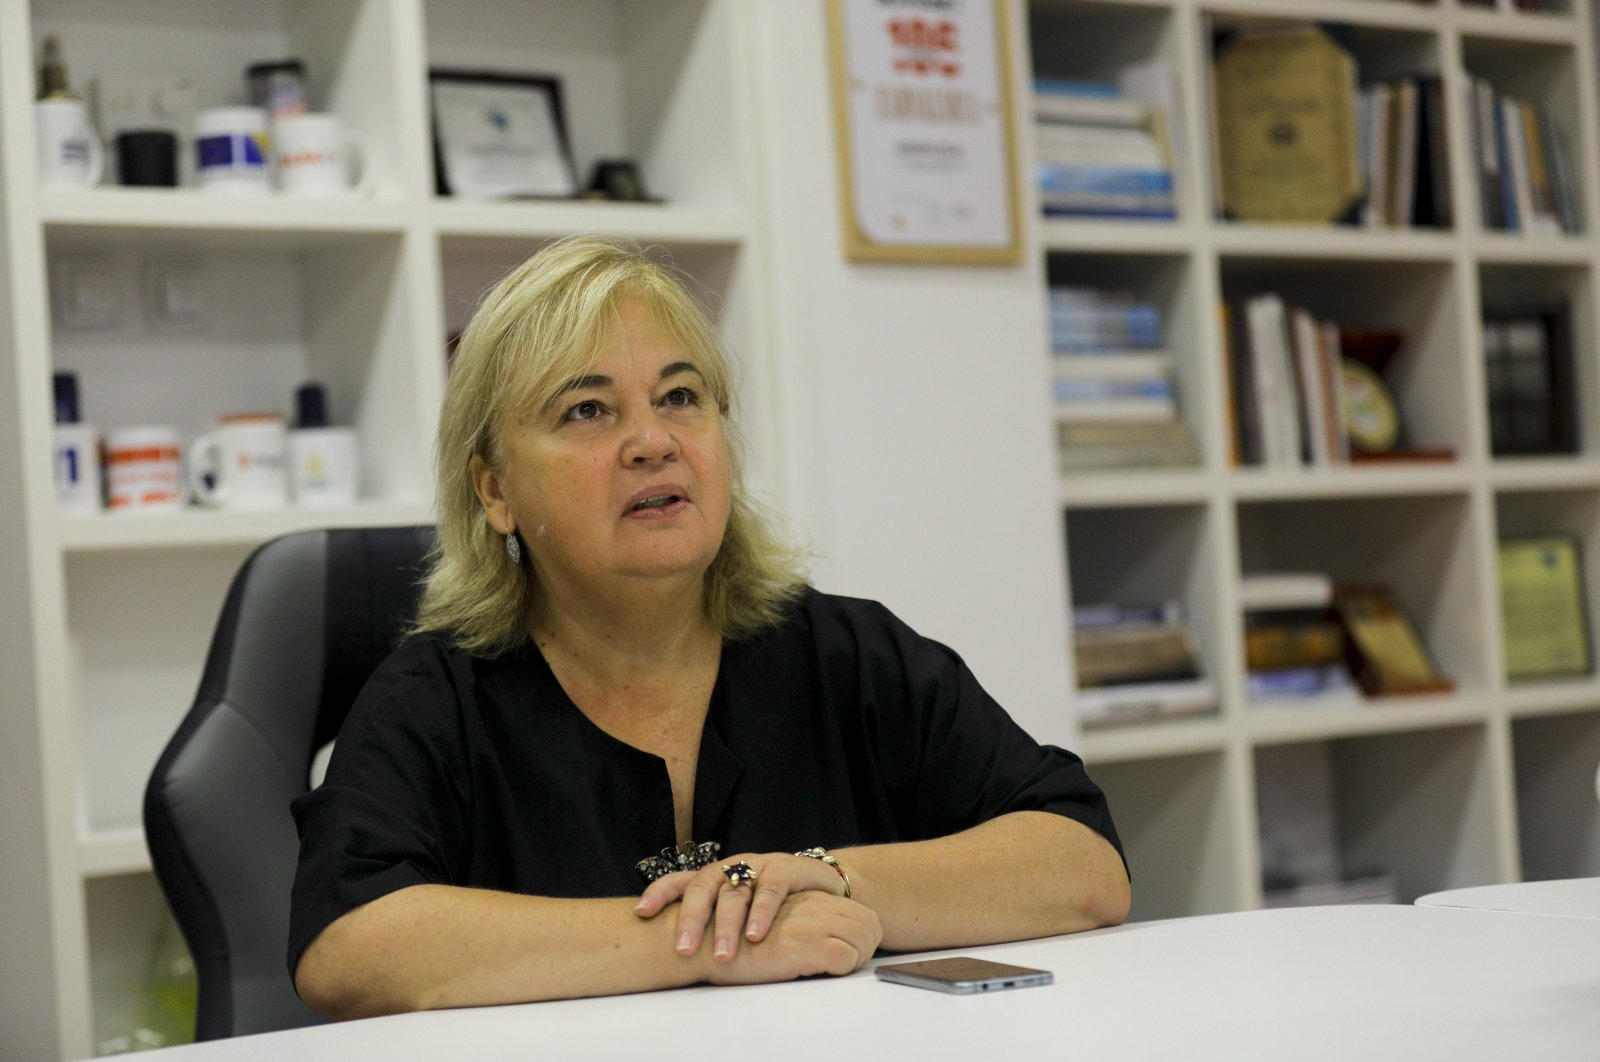 Aida Pilav, head of Sarajevo Canton's Public Health Institute, speaks during an interview, in Sarajevo, Bosnia-Herzegovina, Sept. 23, 2020. (AA Photo)